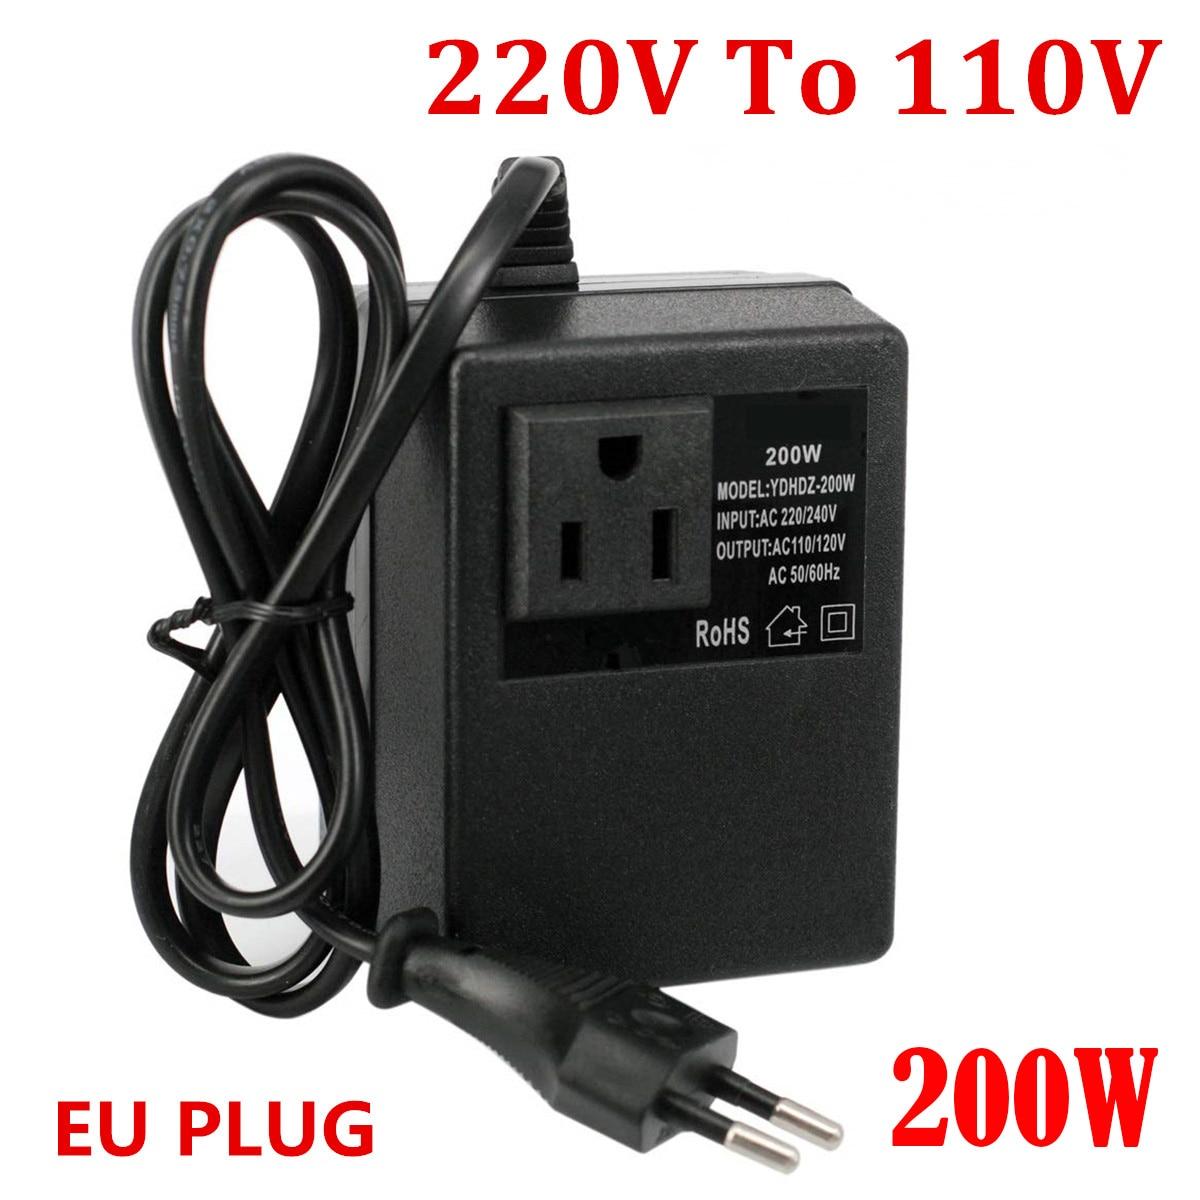 200W Voltage Converter Transformer 220V To 110V Step Down Travel  Voltage Transformer Converter EU Plug